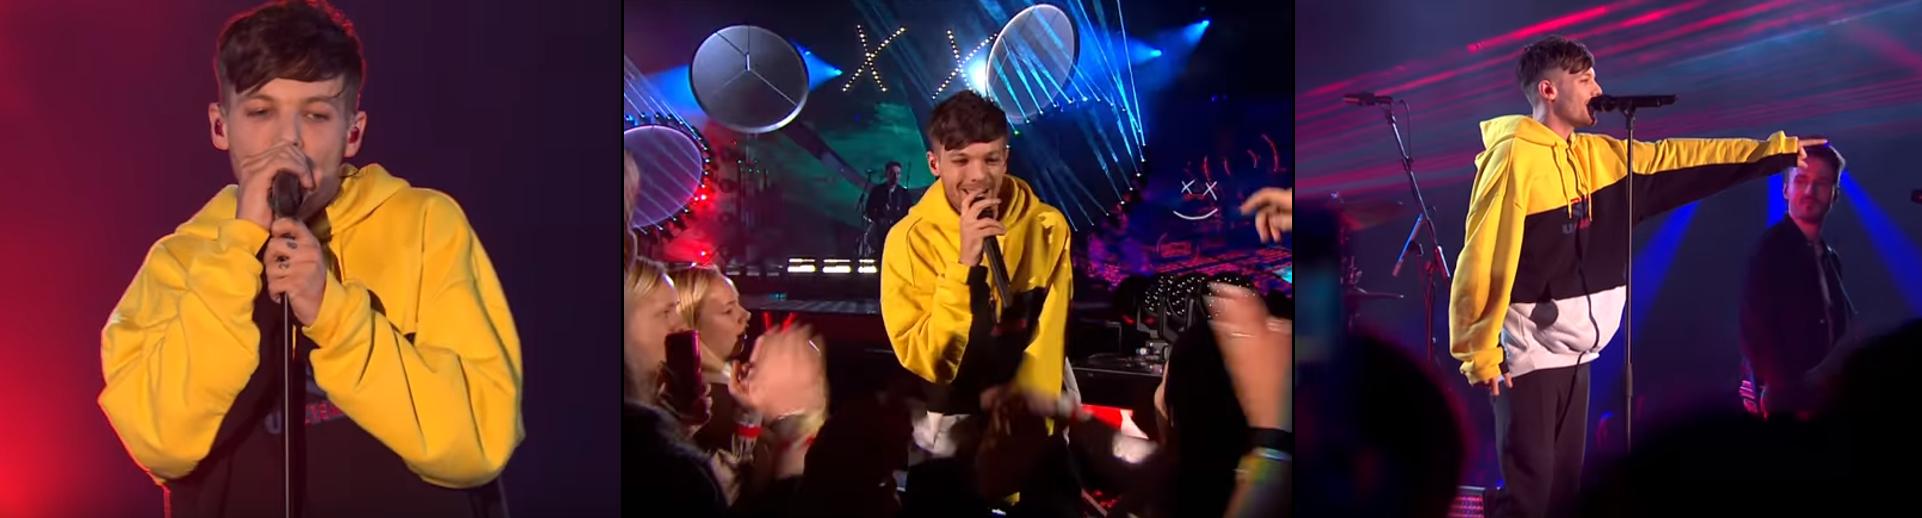 Louis Tomlinson   X Factor    December 2, 2017